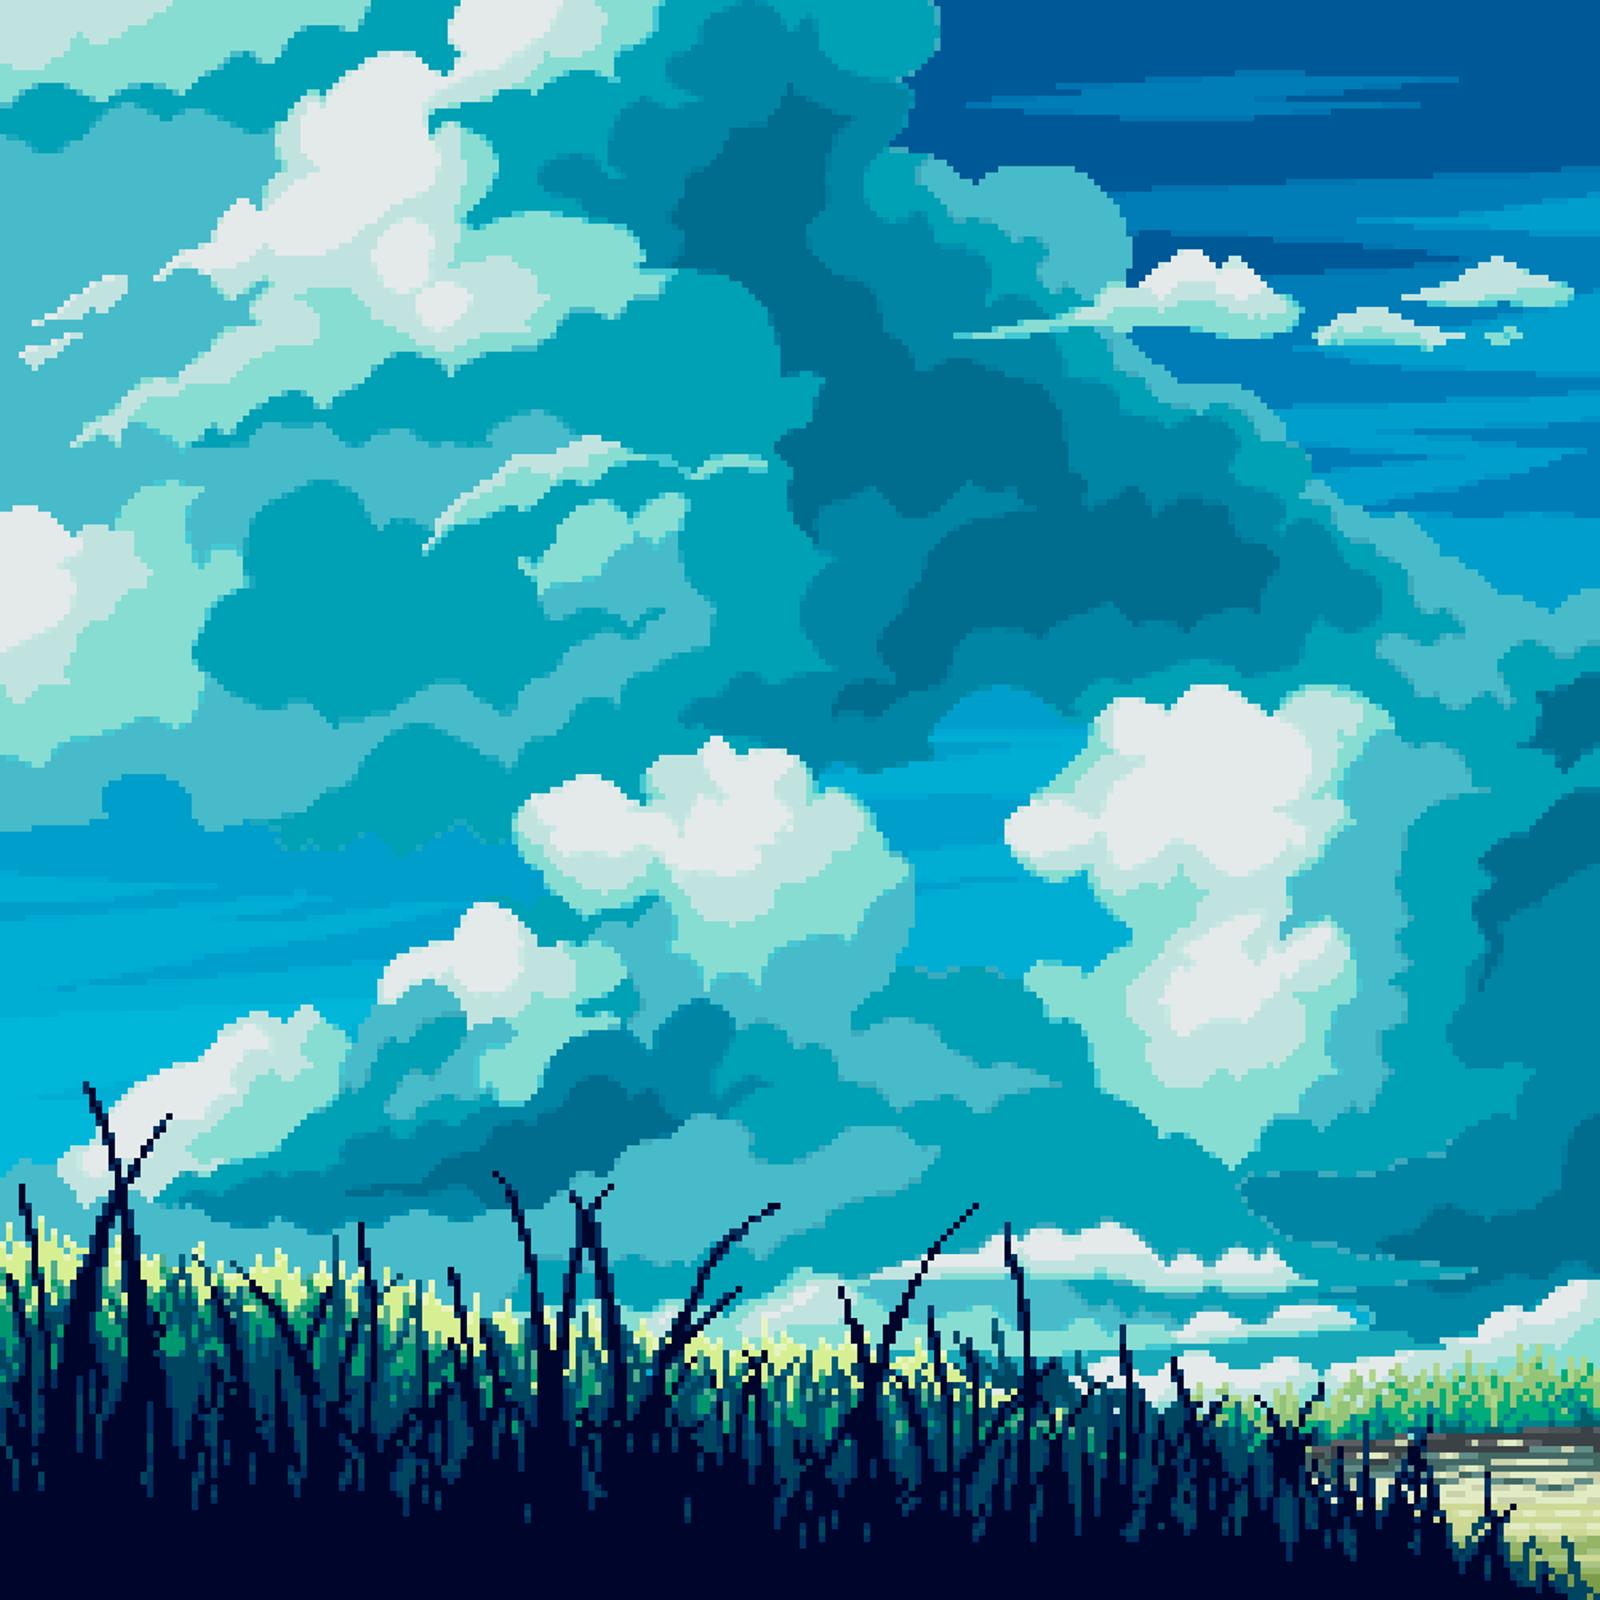 Pixel Art Background, Scenery